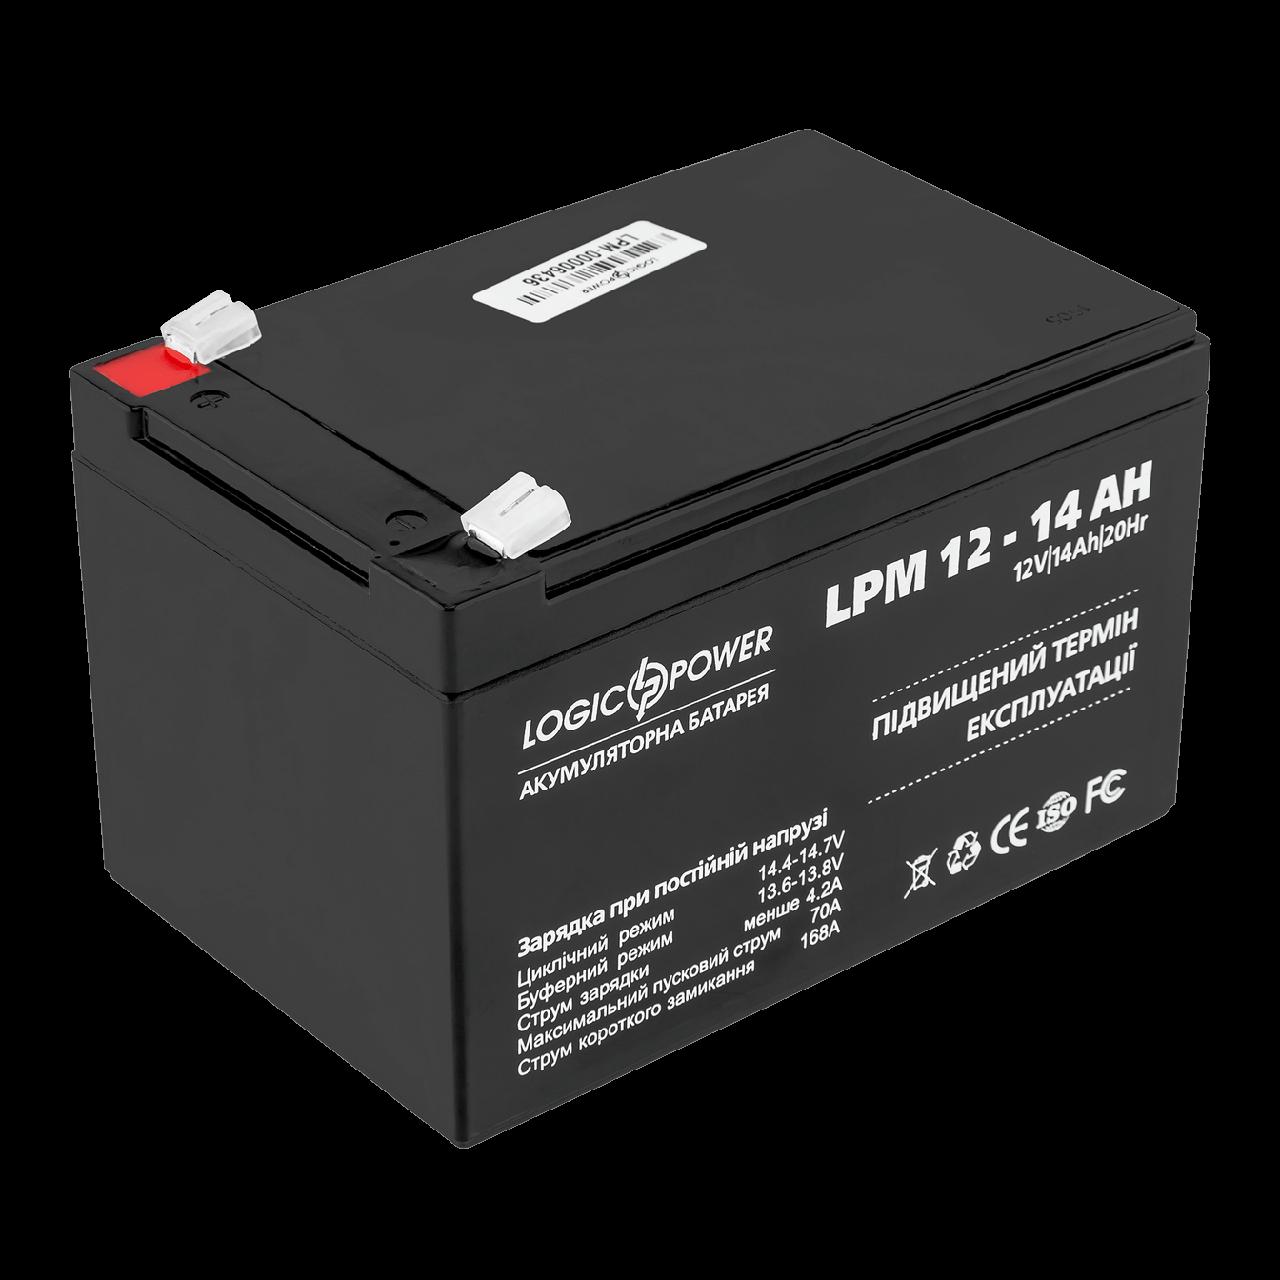 Аккумулятор LPM 12 - 14 AH